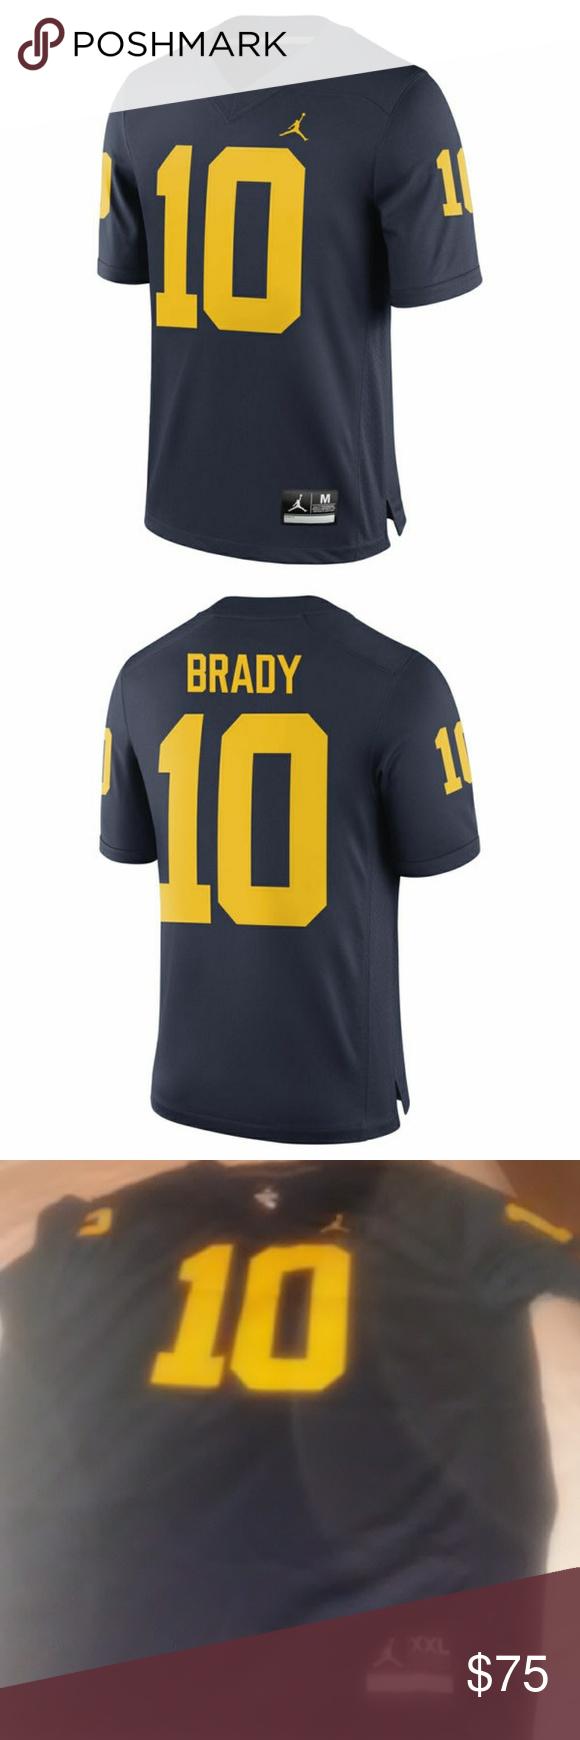 54e9f8d8084dbf Tom Brady Michigan Wolverines Brand Jordan Alumni Brand new Jordan Other